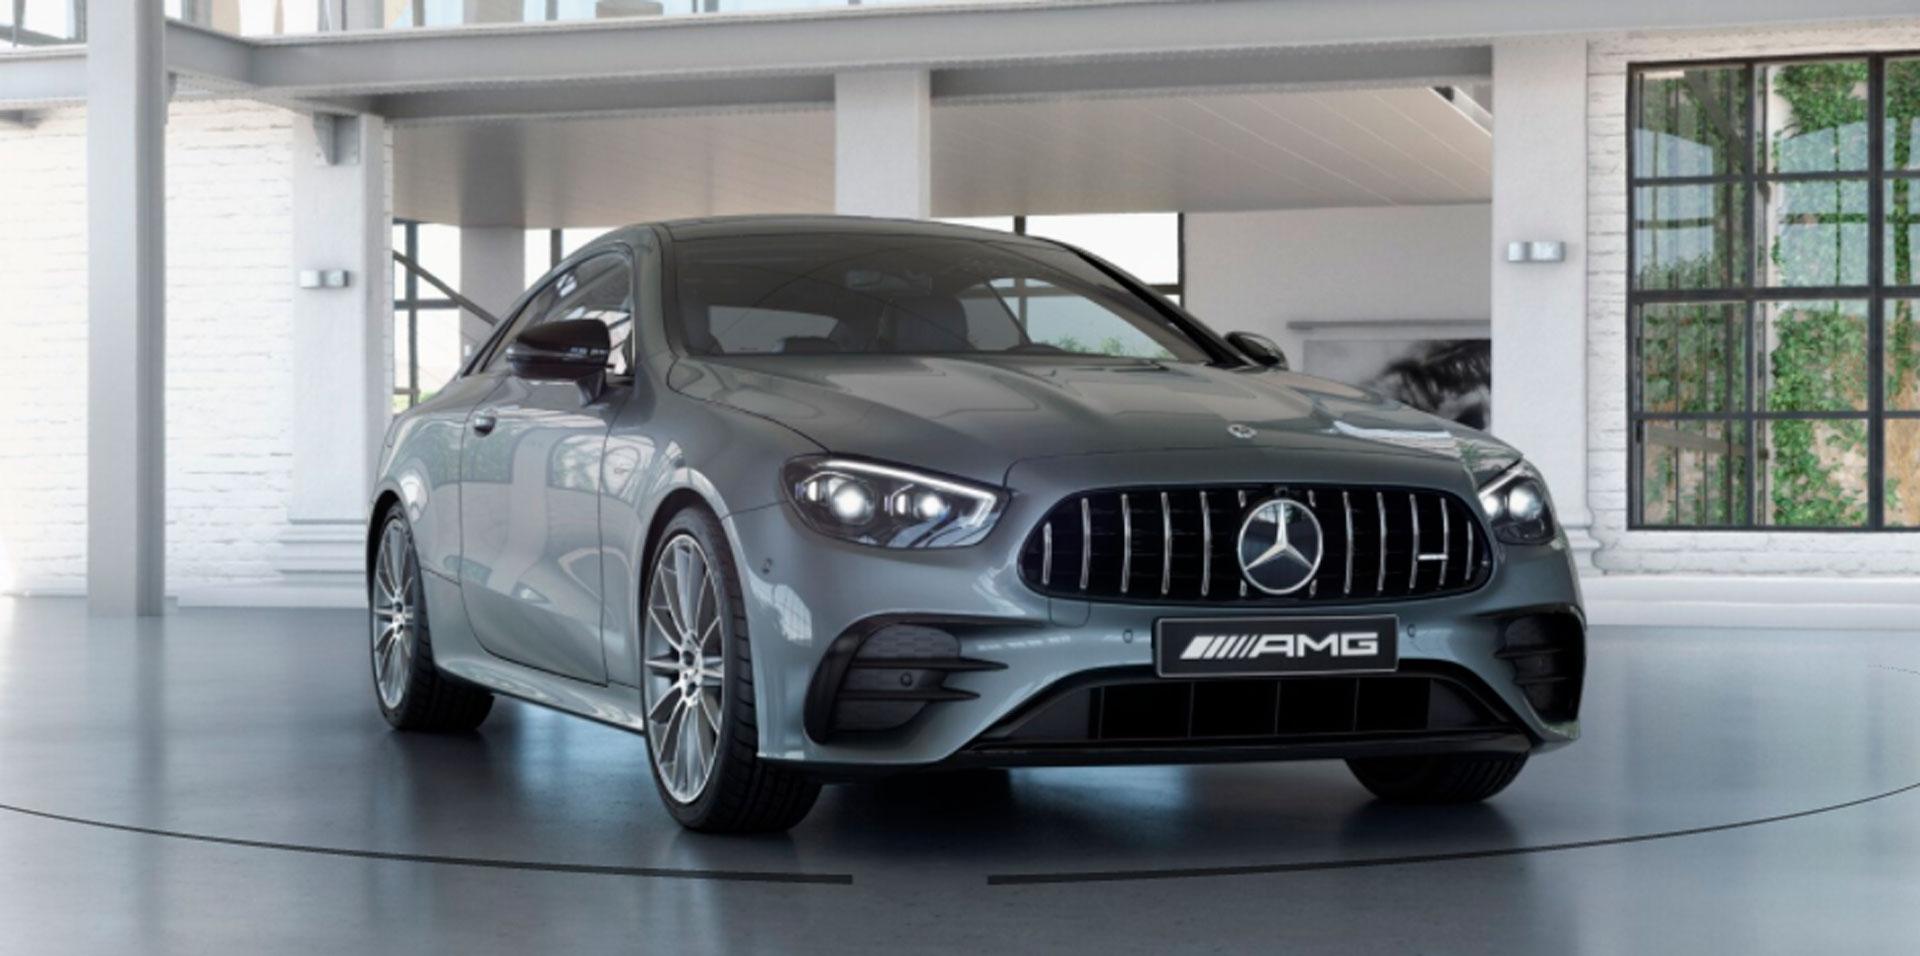 Mercedes-AMG E-Class Coupe 0152601172